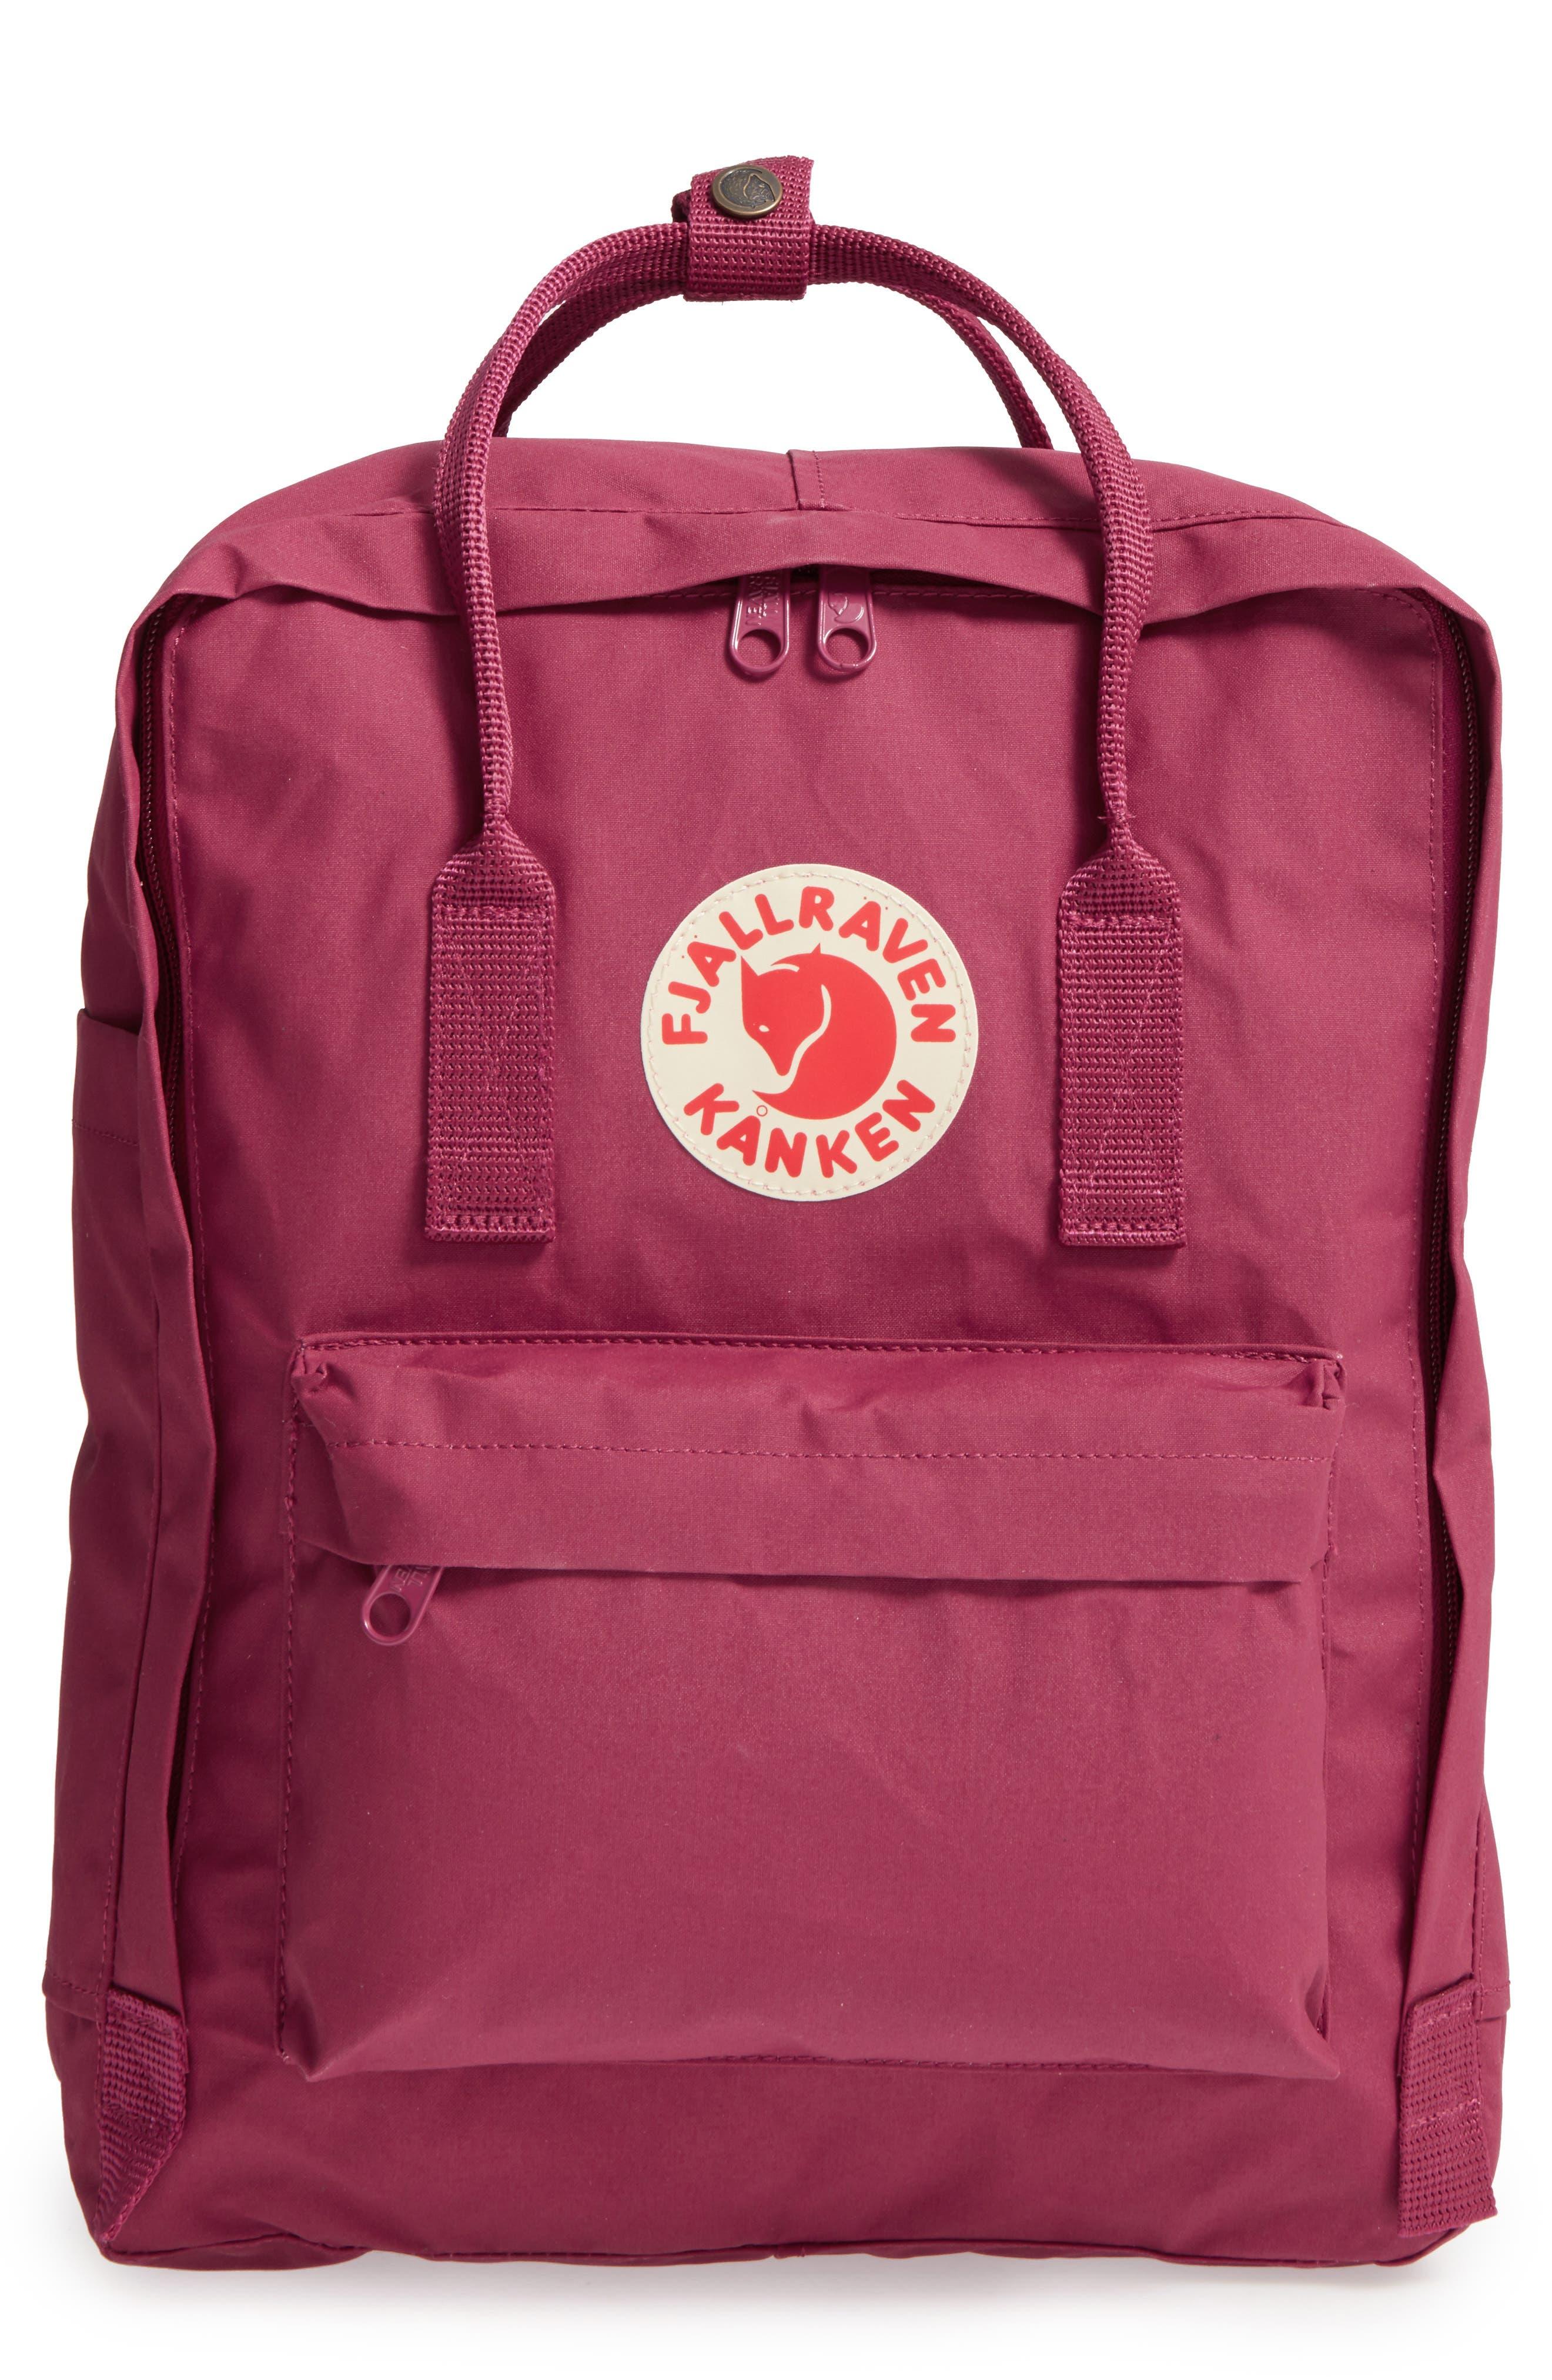 Alternate Image 1 Selected - Fjällräven Kånken Backpack